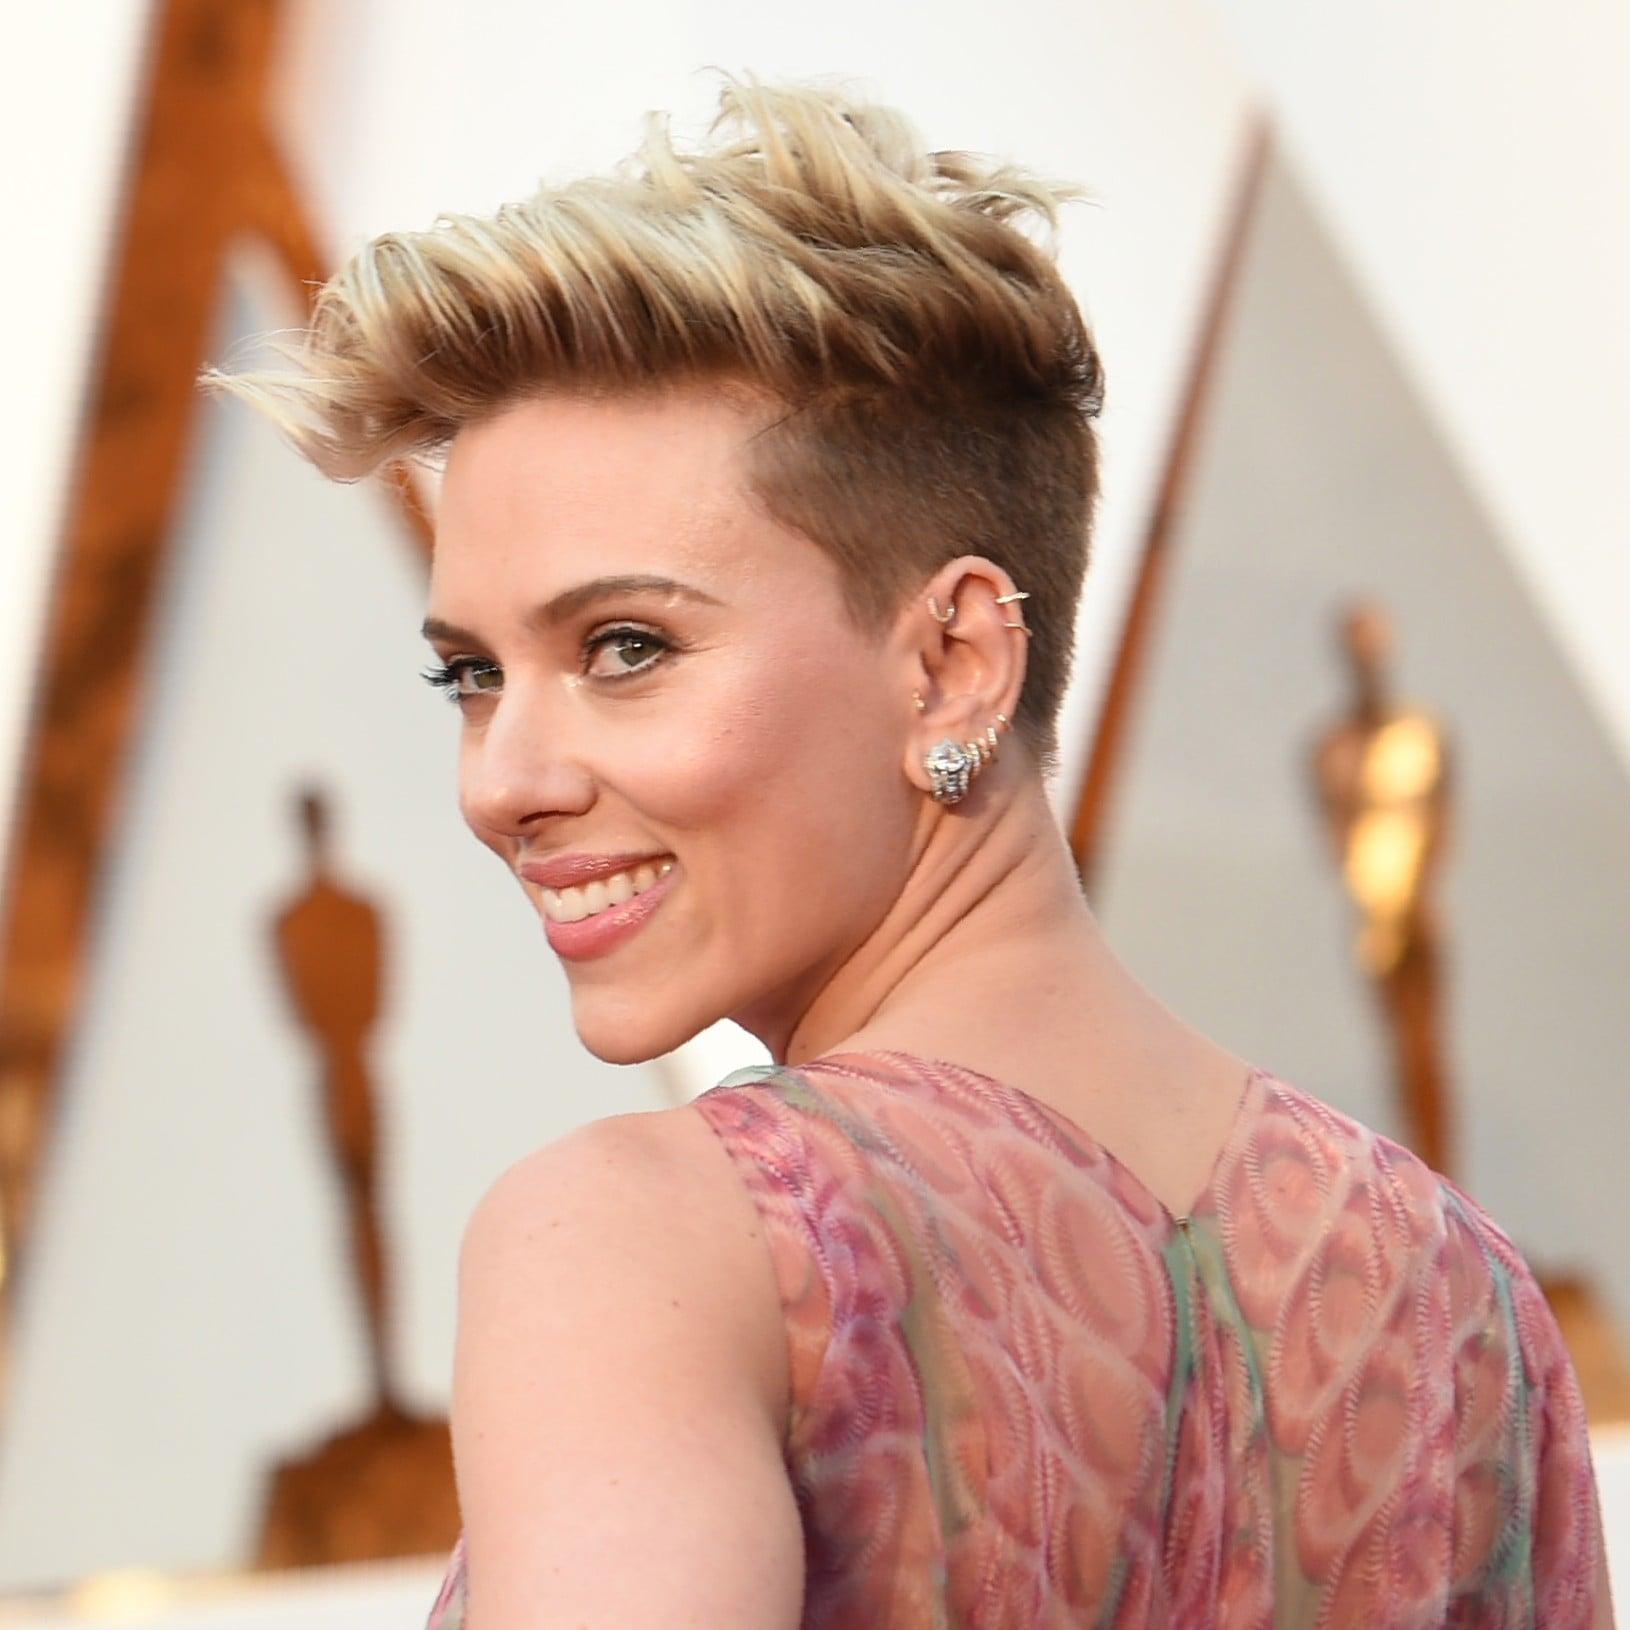 Scarlett Johansson\'s Hair and Makeup at the 2017 Oscars | POPSUGAR ...